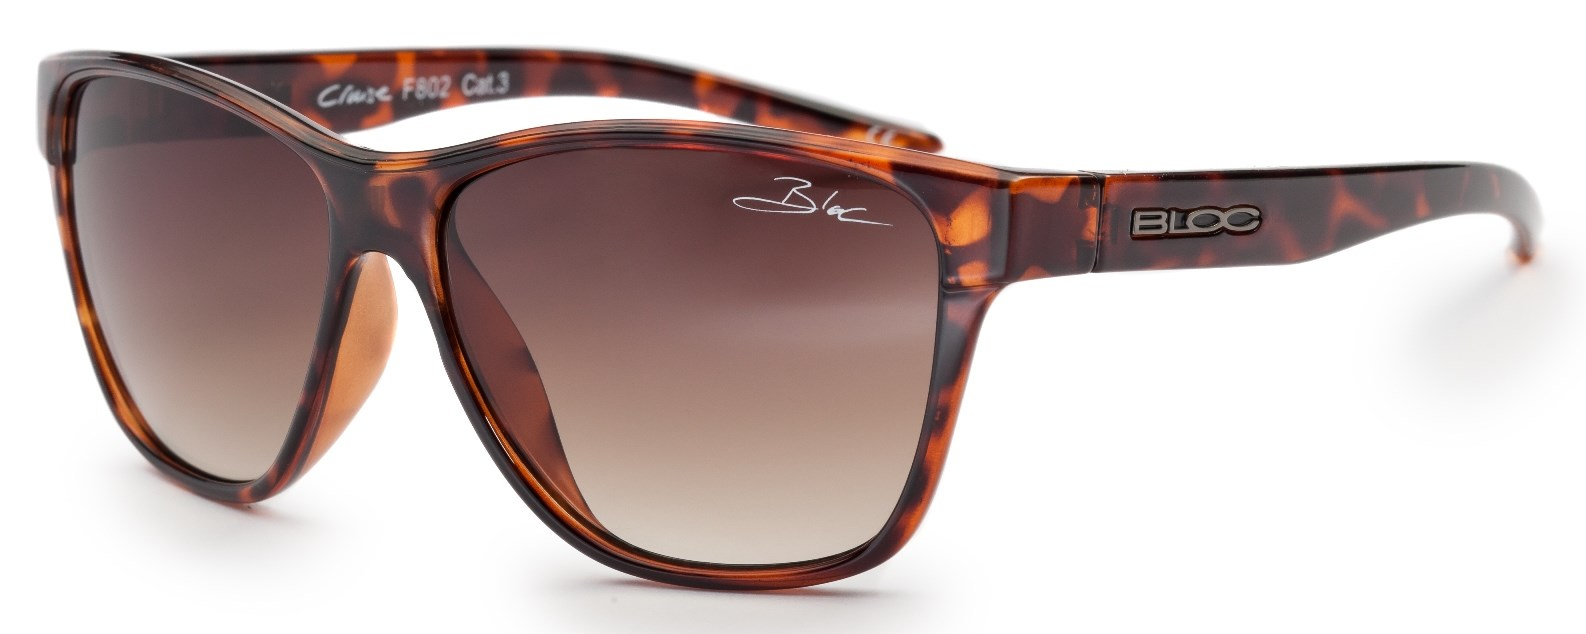 386f7b363d9 Bloc Cruise F802 Sunglasses In Tortoise Shell The Ski Shop £30.00